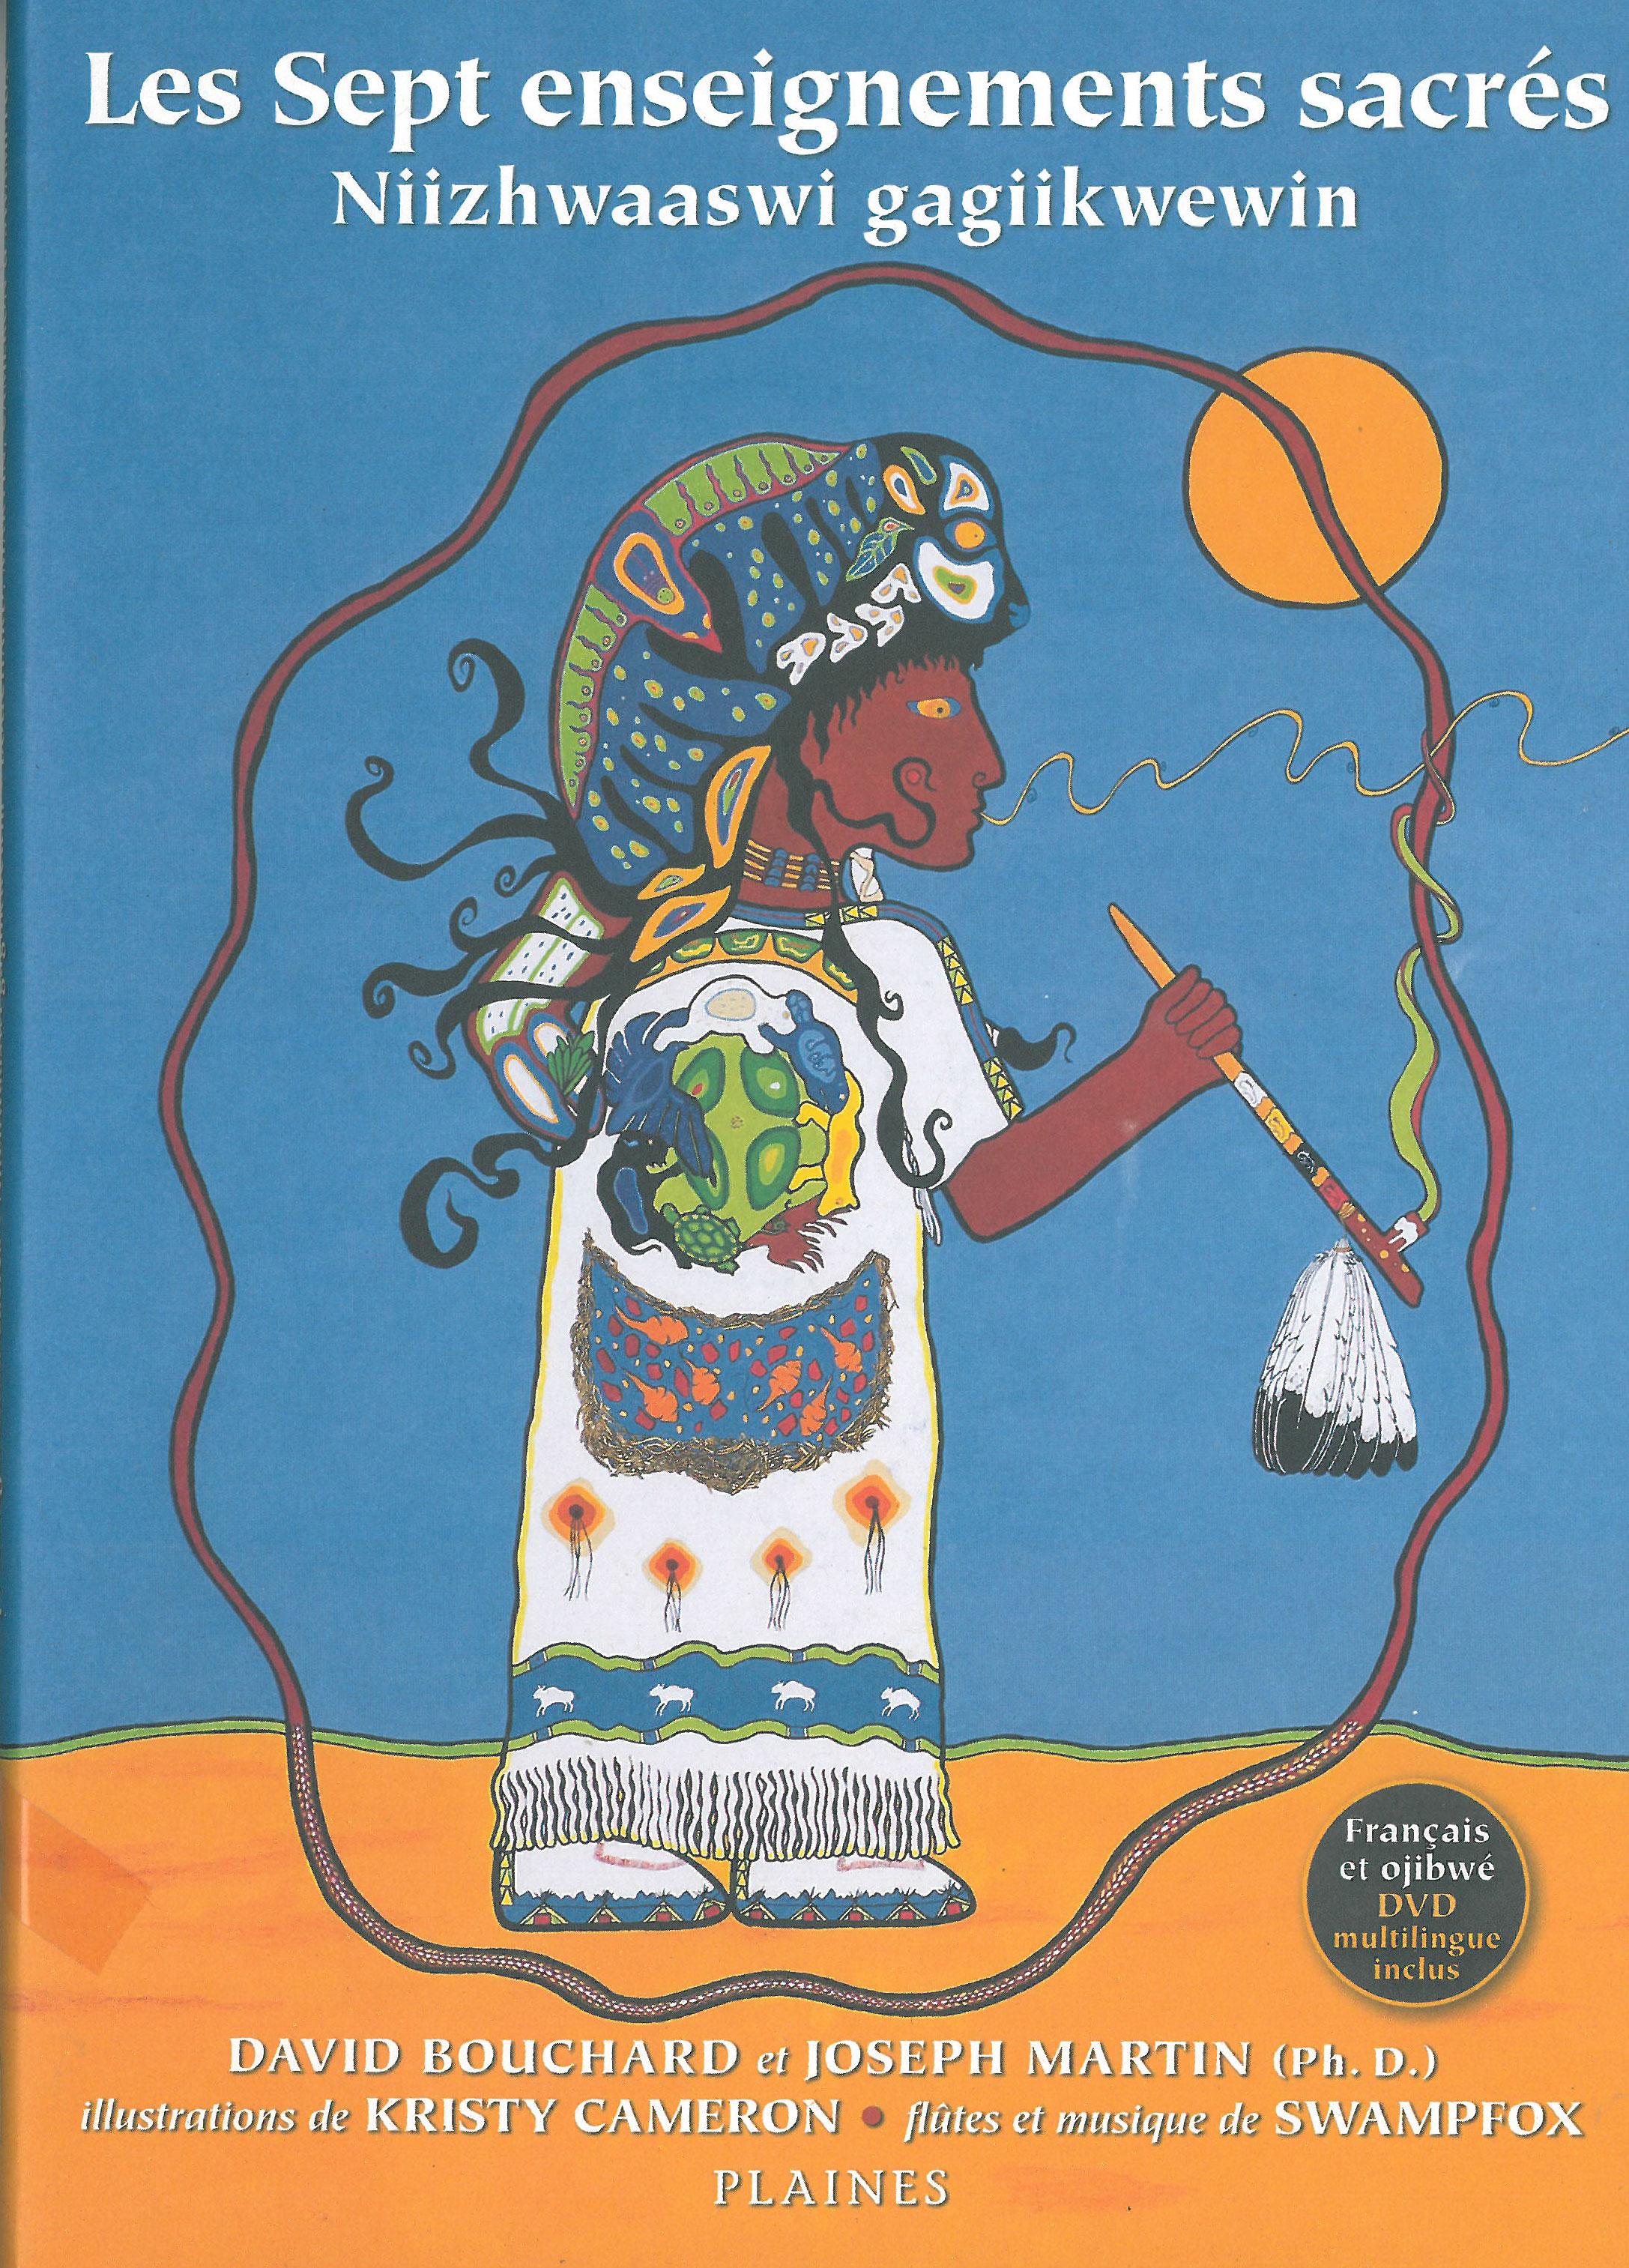 Les sept enseignements sacrés de la Femme Bison Blanc Niizhwaaswi Aanike'iniwendiwin : waabishiki mashkode bizhikiins ikwe